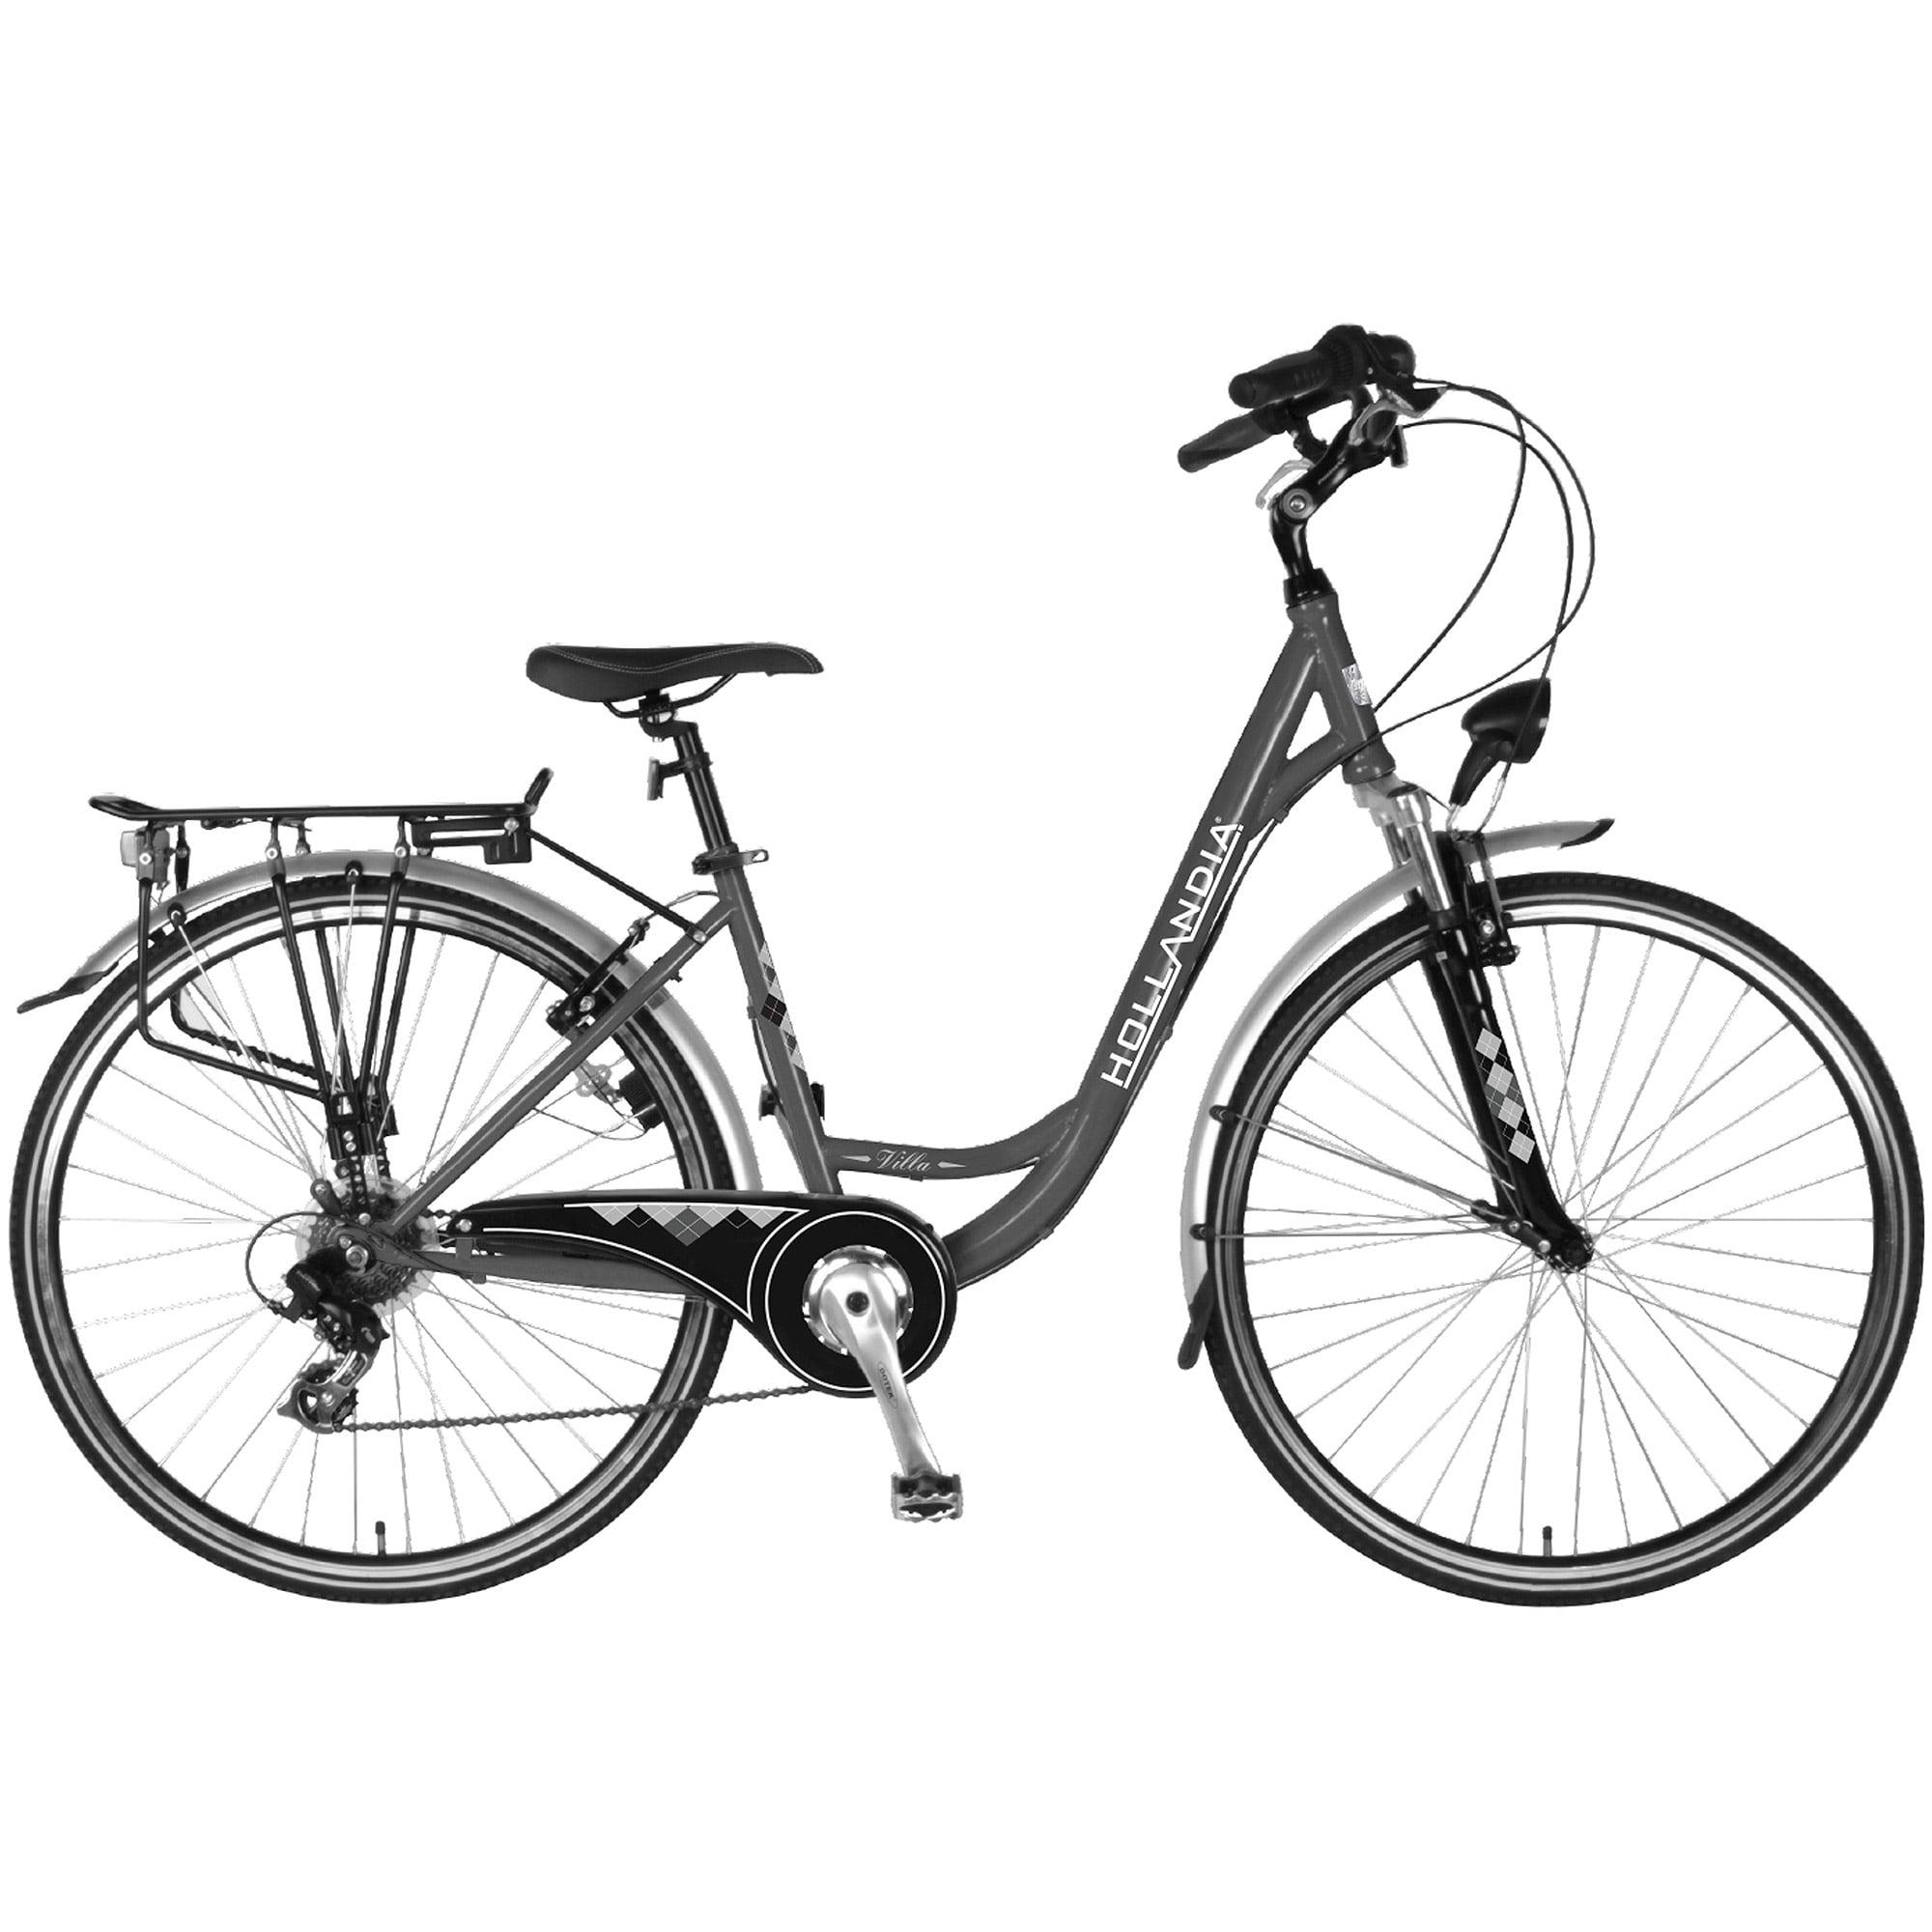 Hollandia Villa Commuter Bicycle